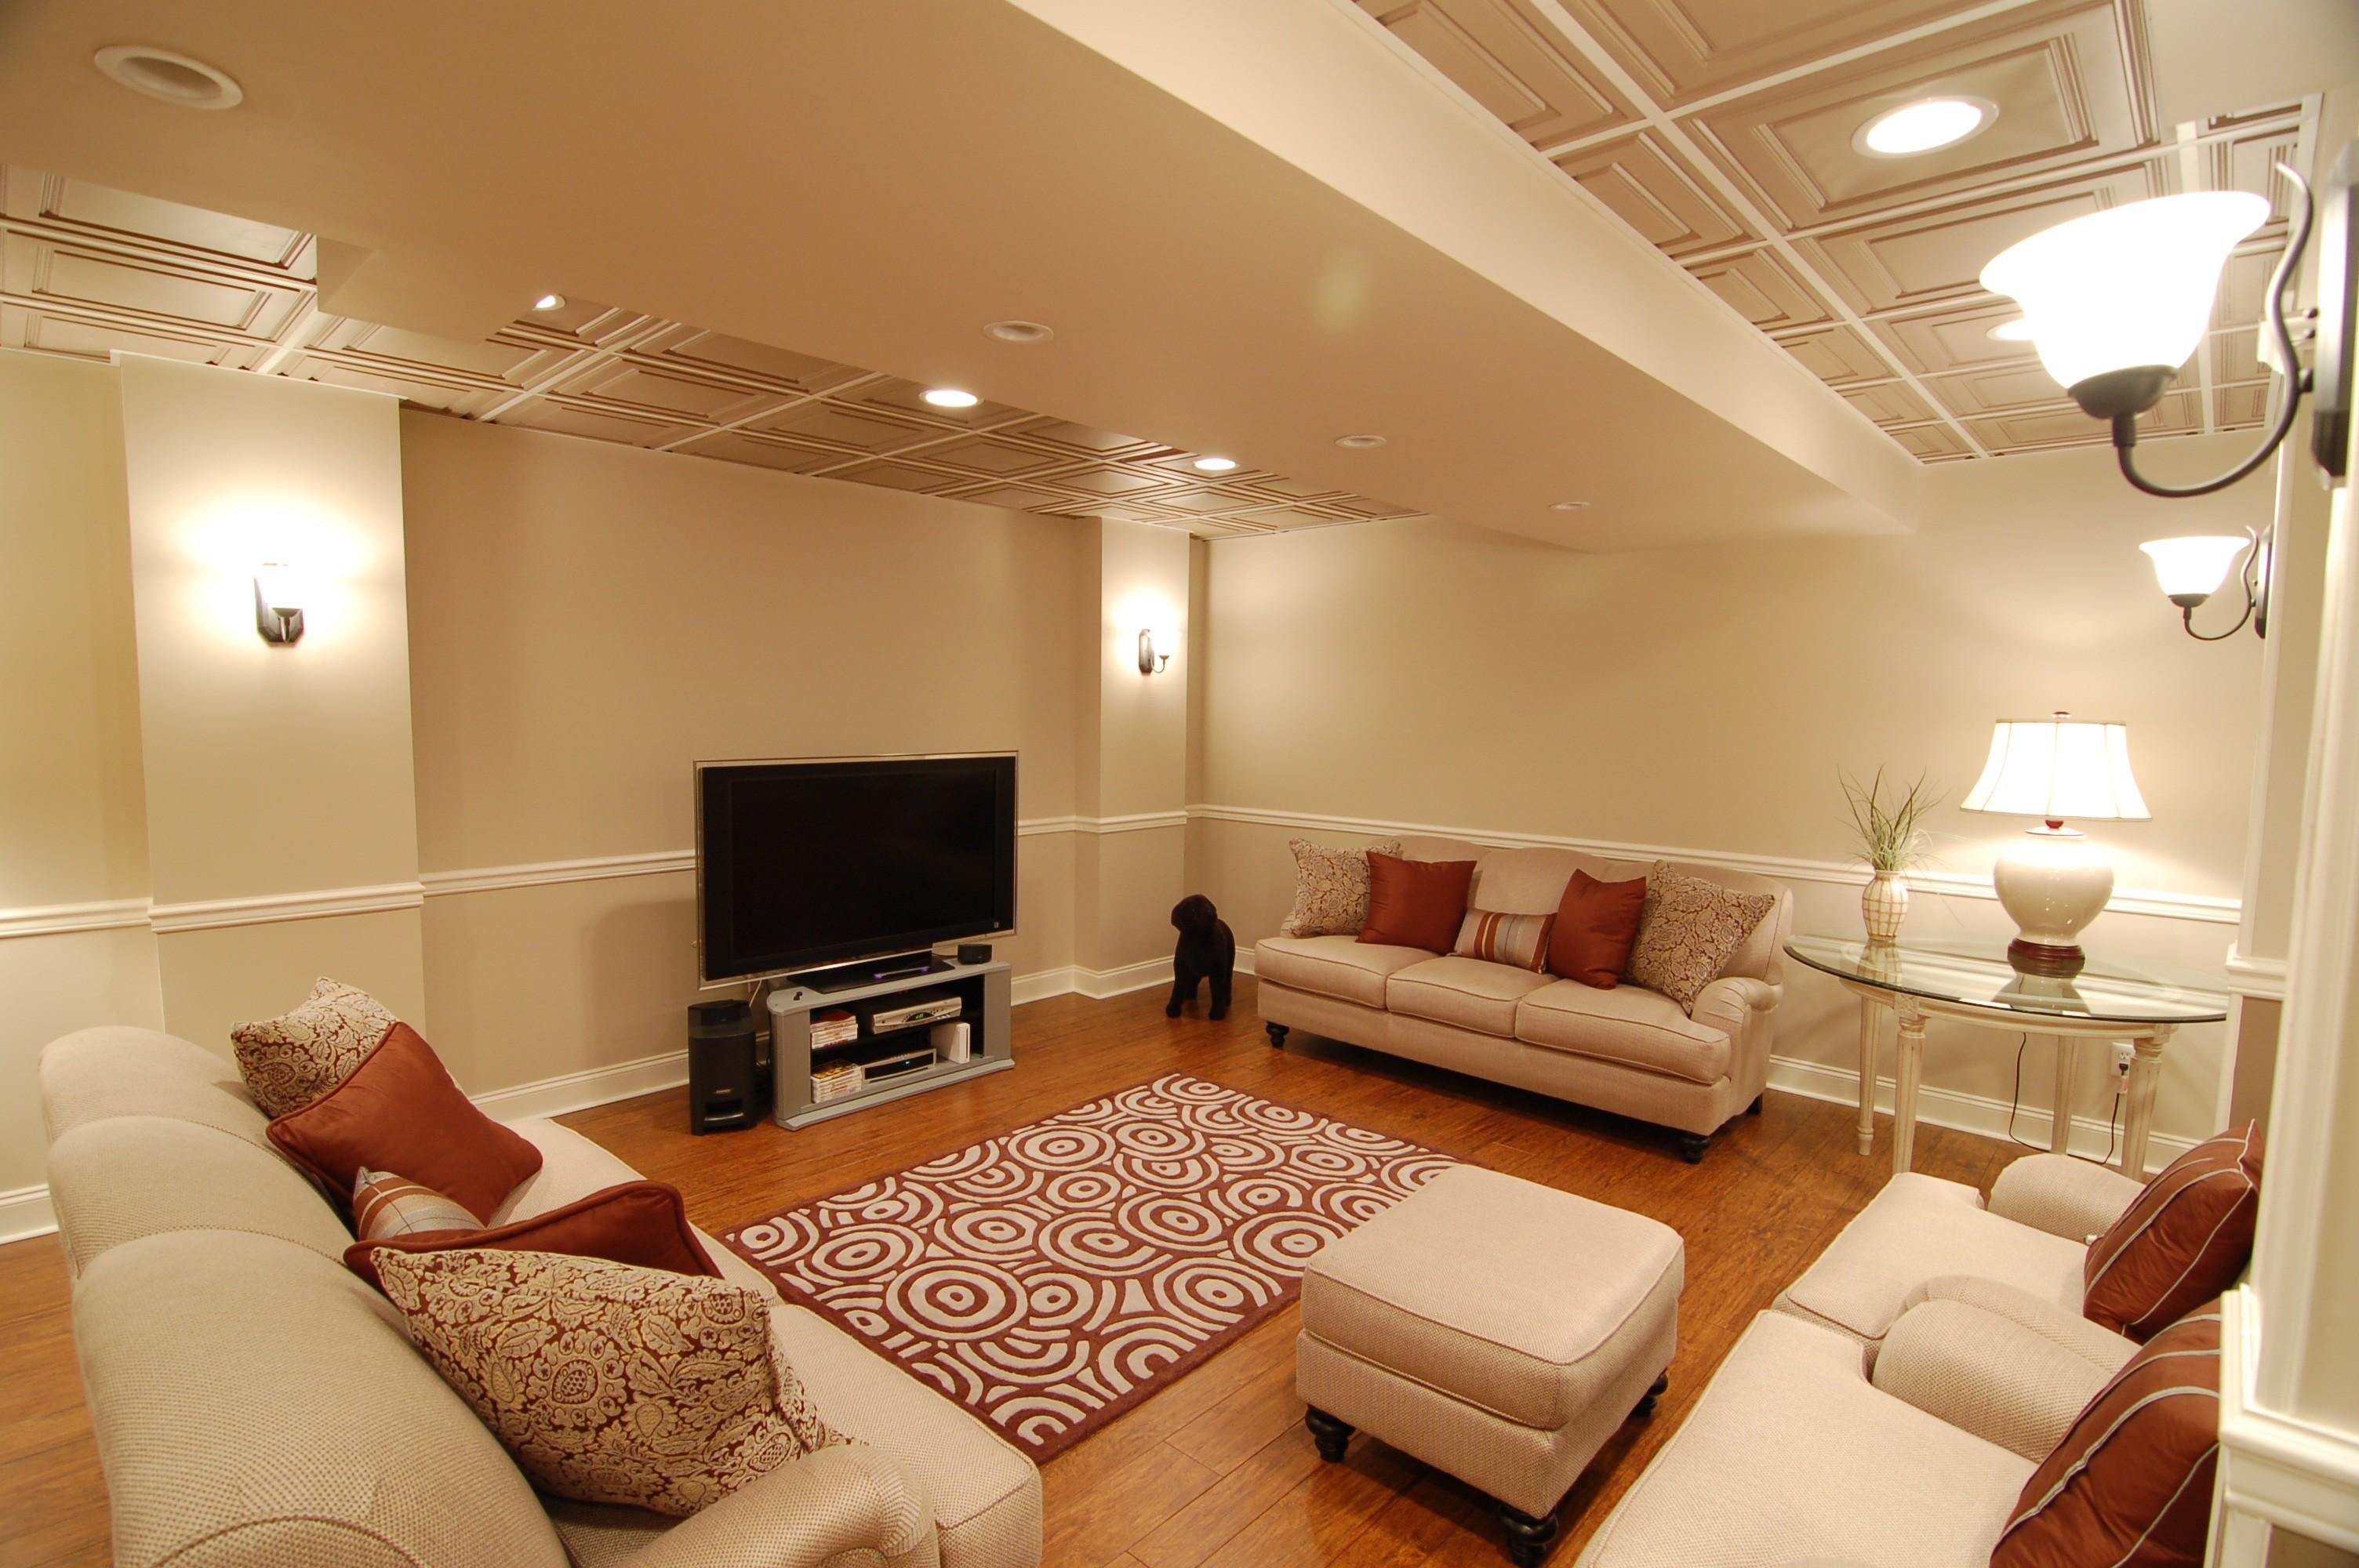 NJ Basement Remodeling Ideas for Your Dream Basement   Design Build Planners